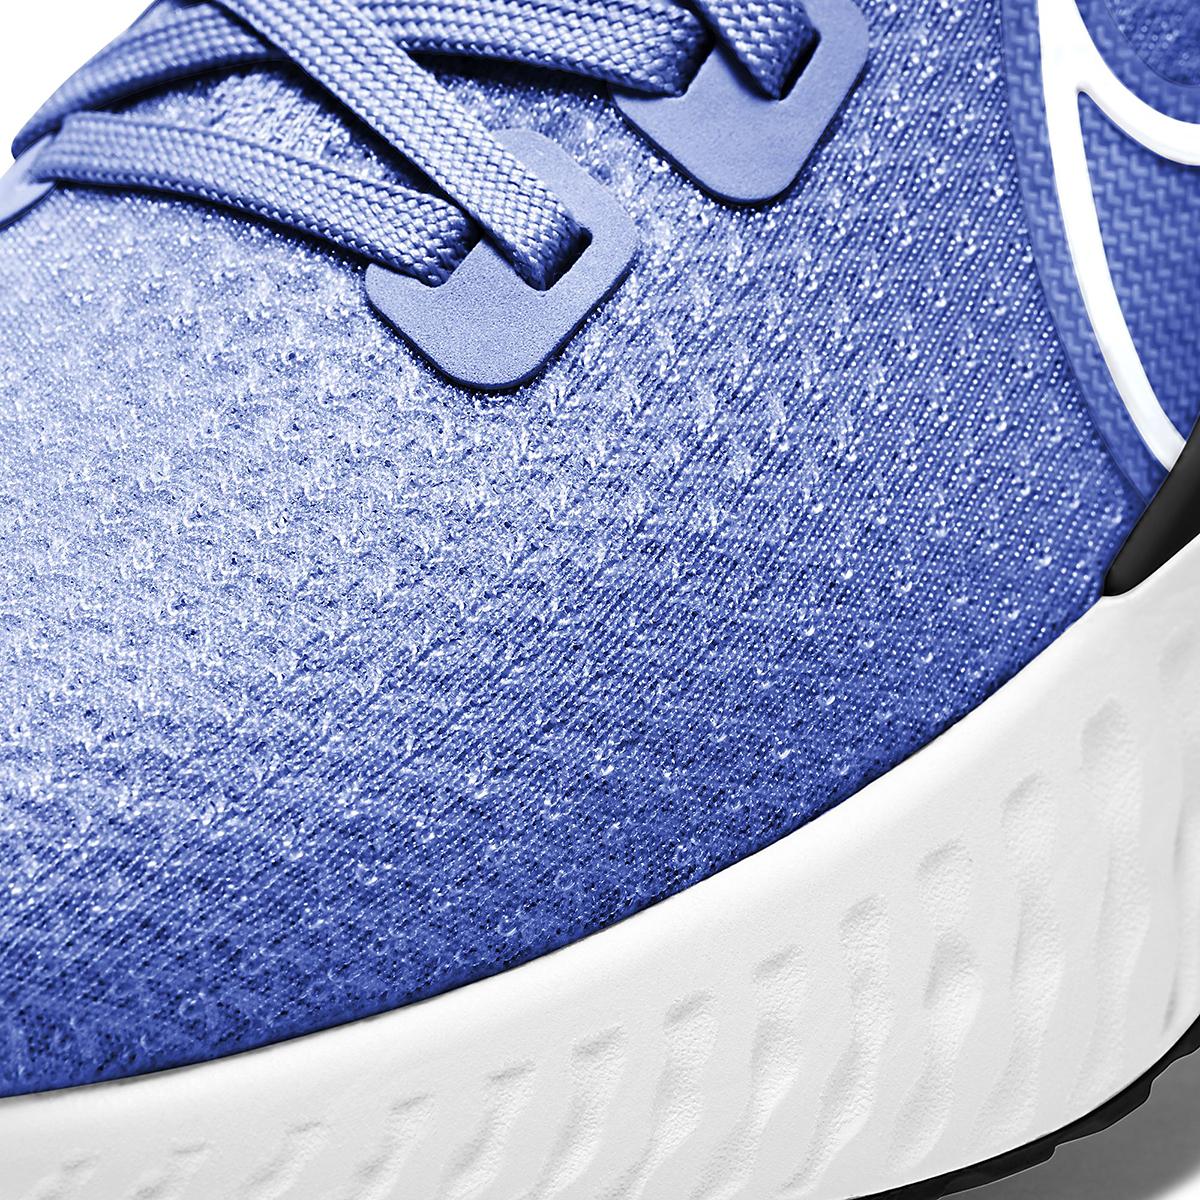 Men's Nike Nike React Infinity Run Flyknit Running Shoe - Color: Racer Blue/White-Bright Crimson-Black - Size: 6.5 - Width: Regular, Racer Blue/White-Bright Crimson-Black, large, image 4